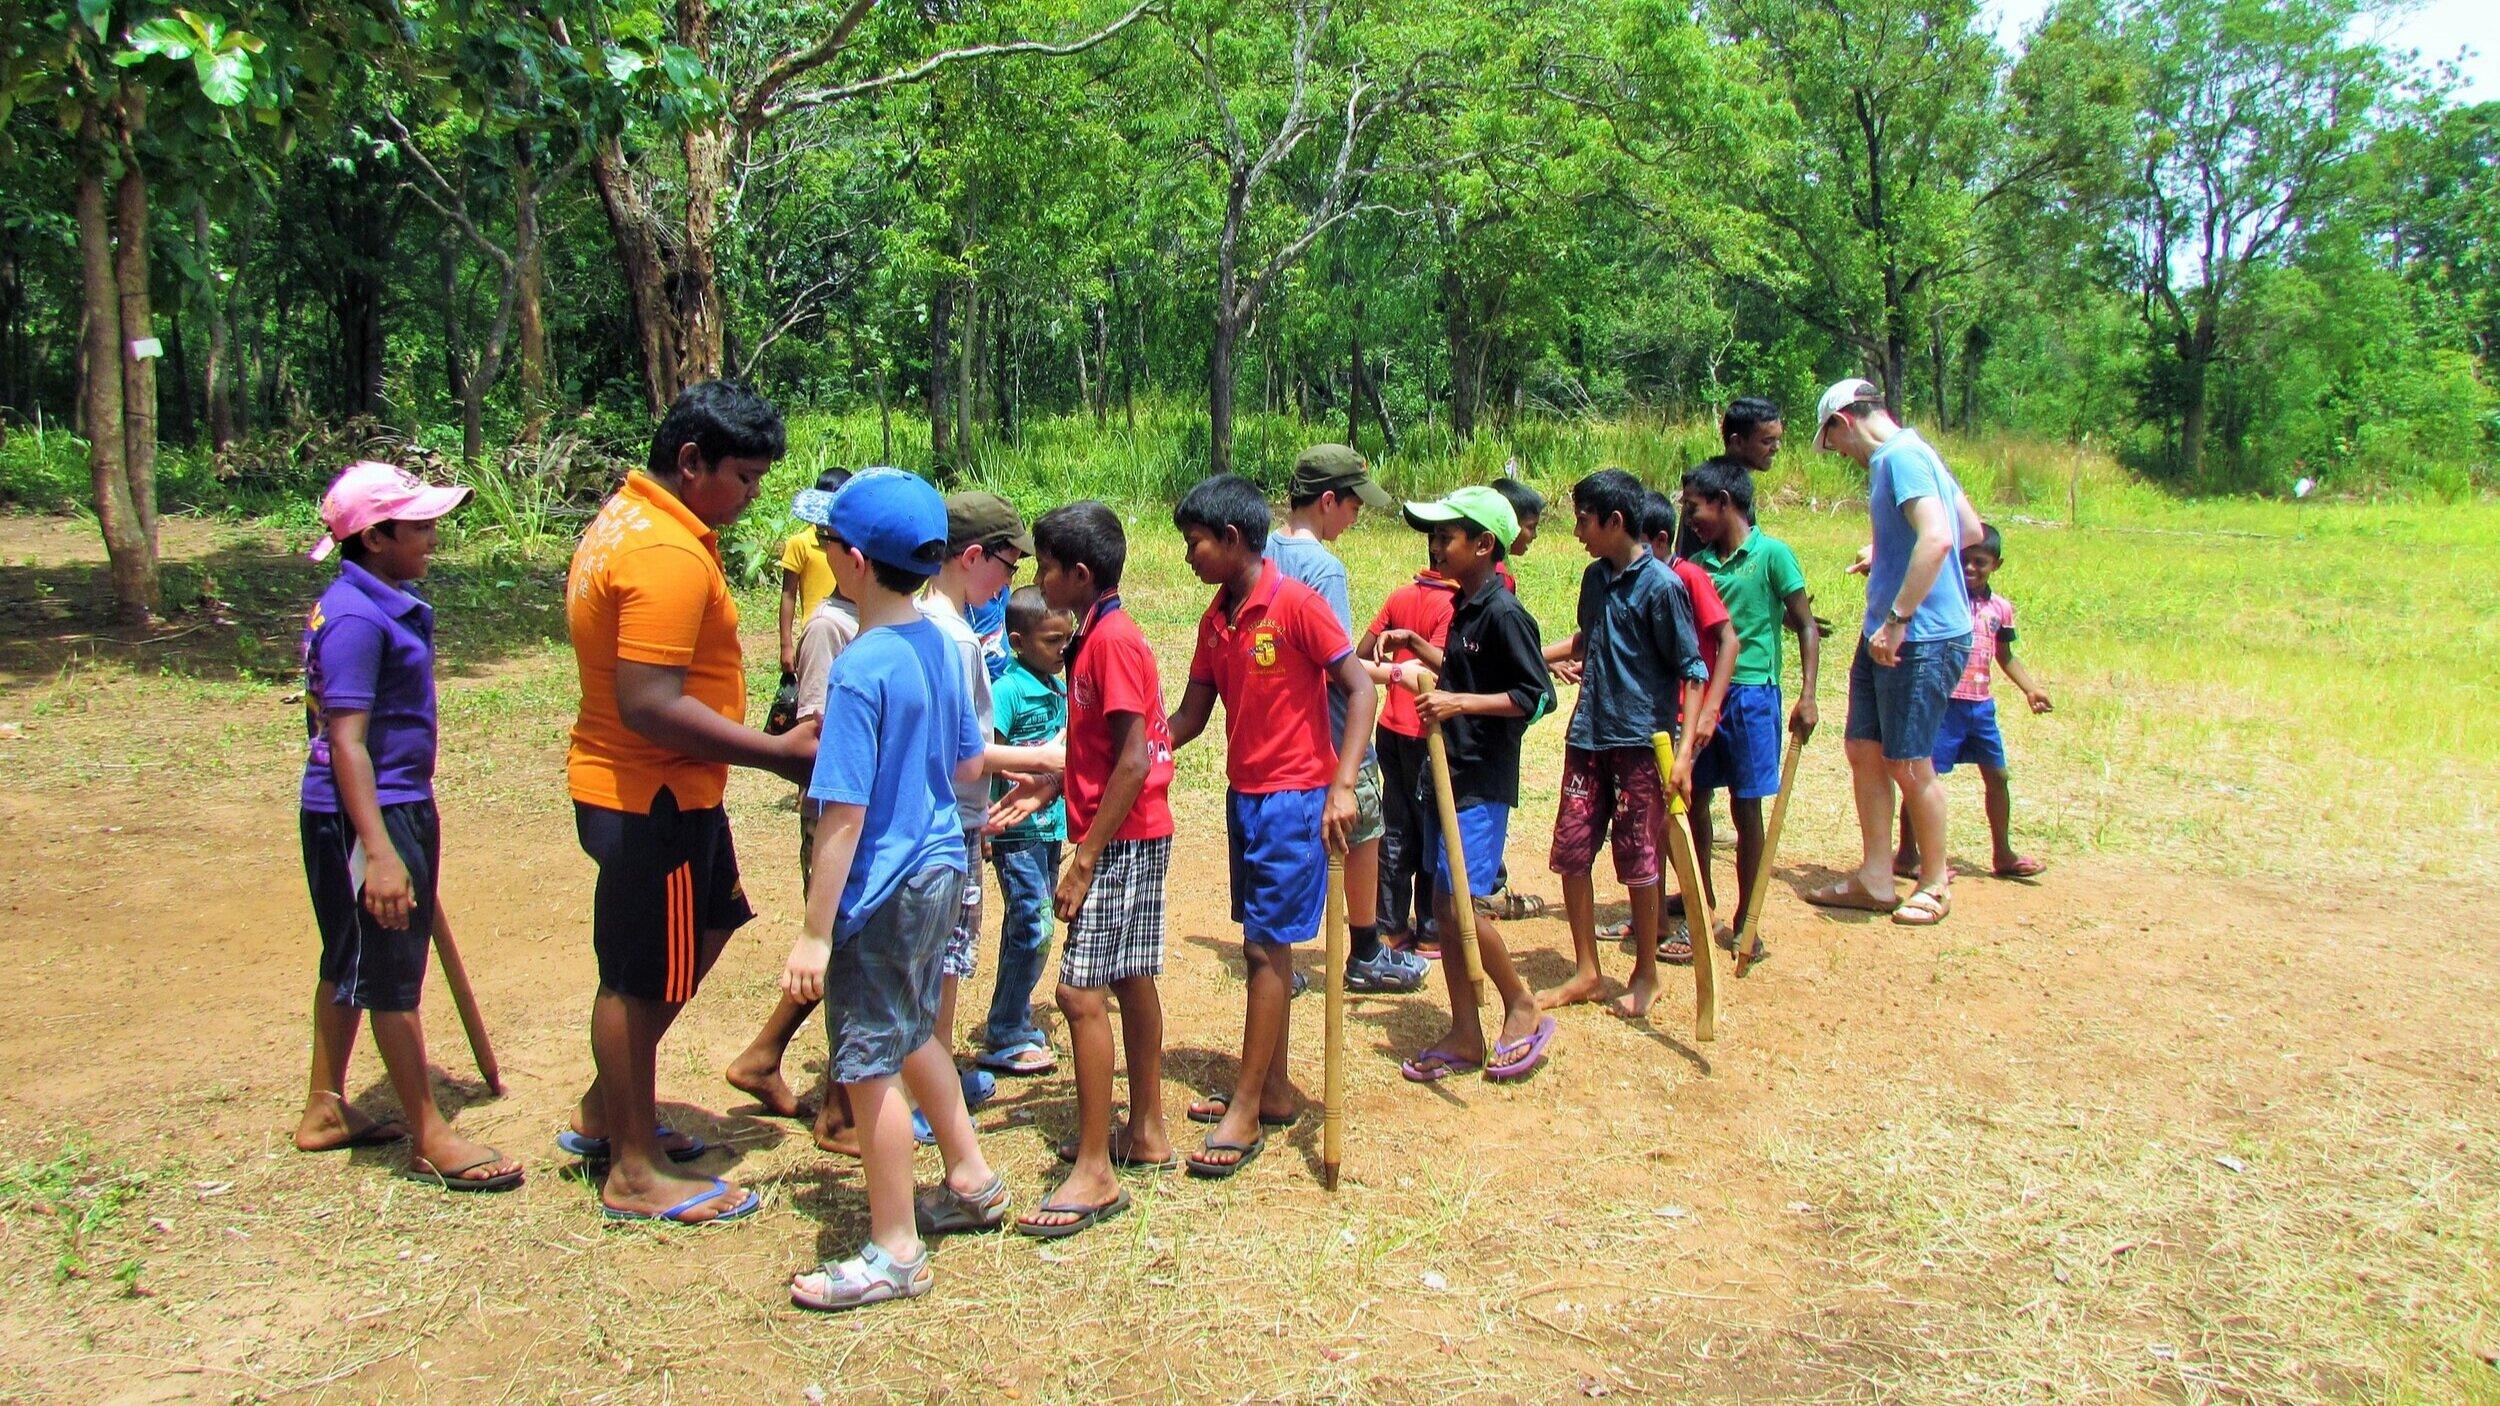 classrooms-in-the-wild-cricket-sri-lanka